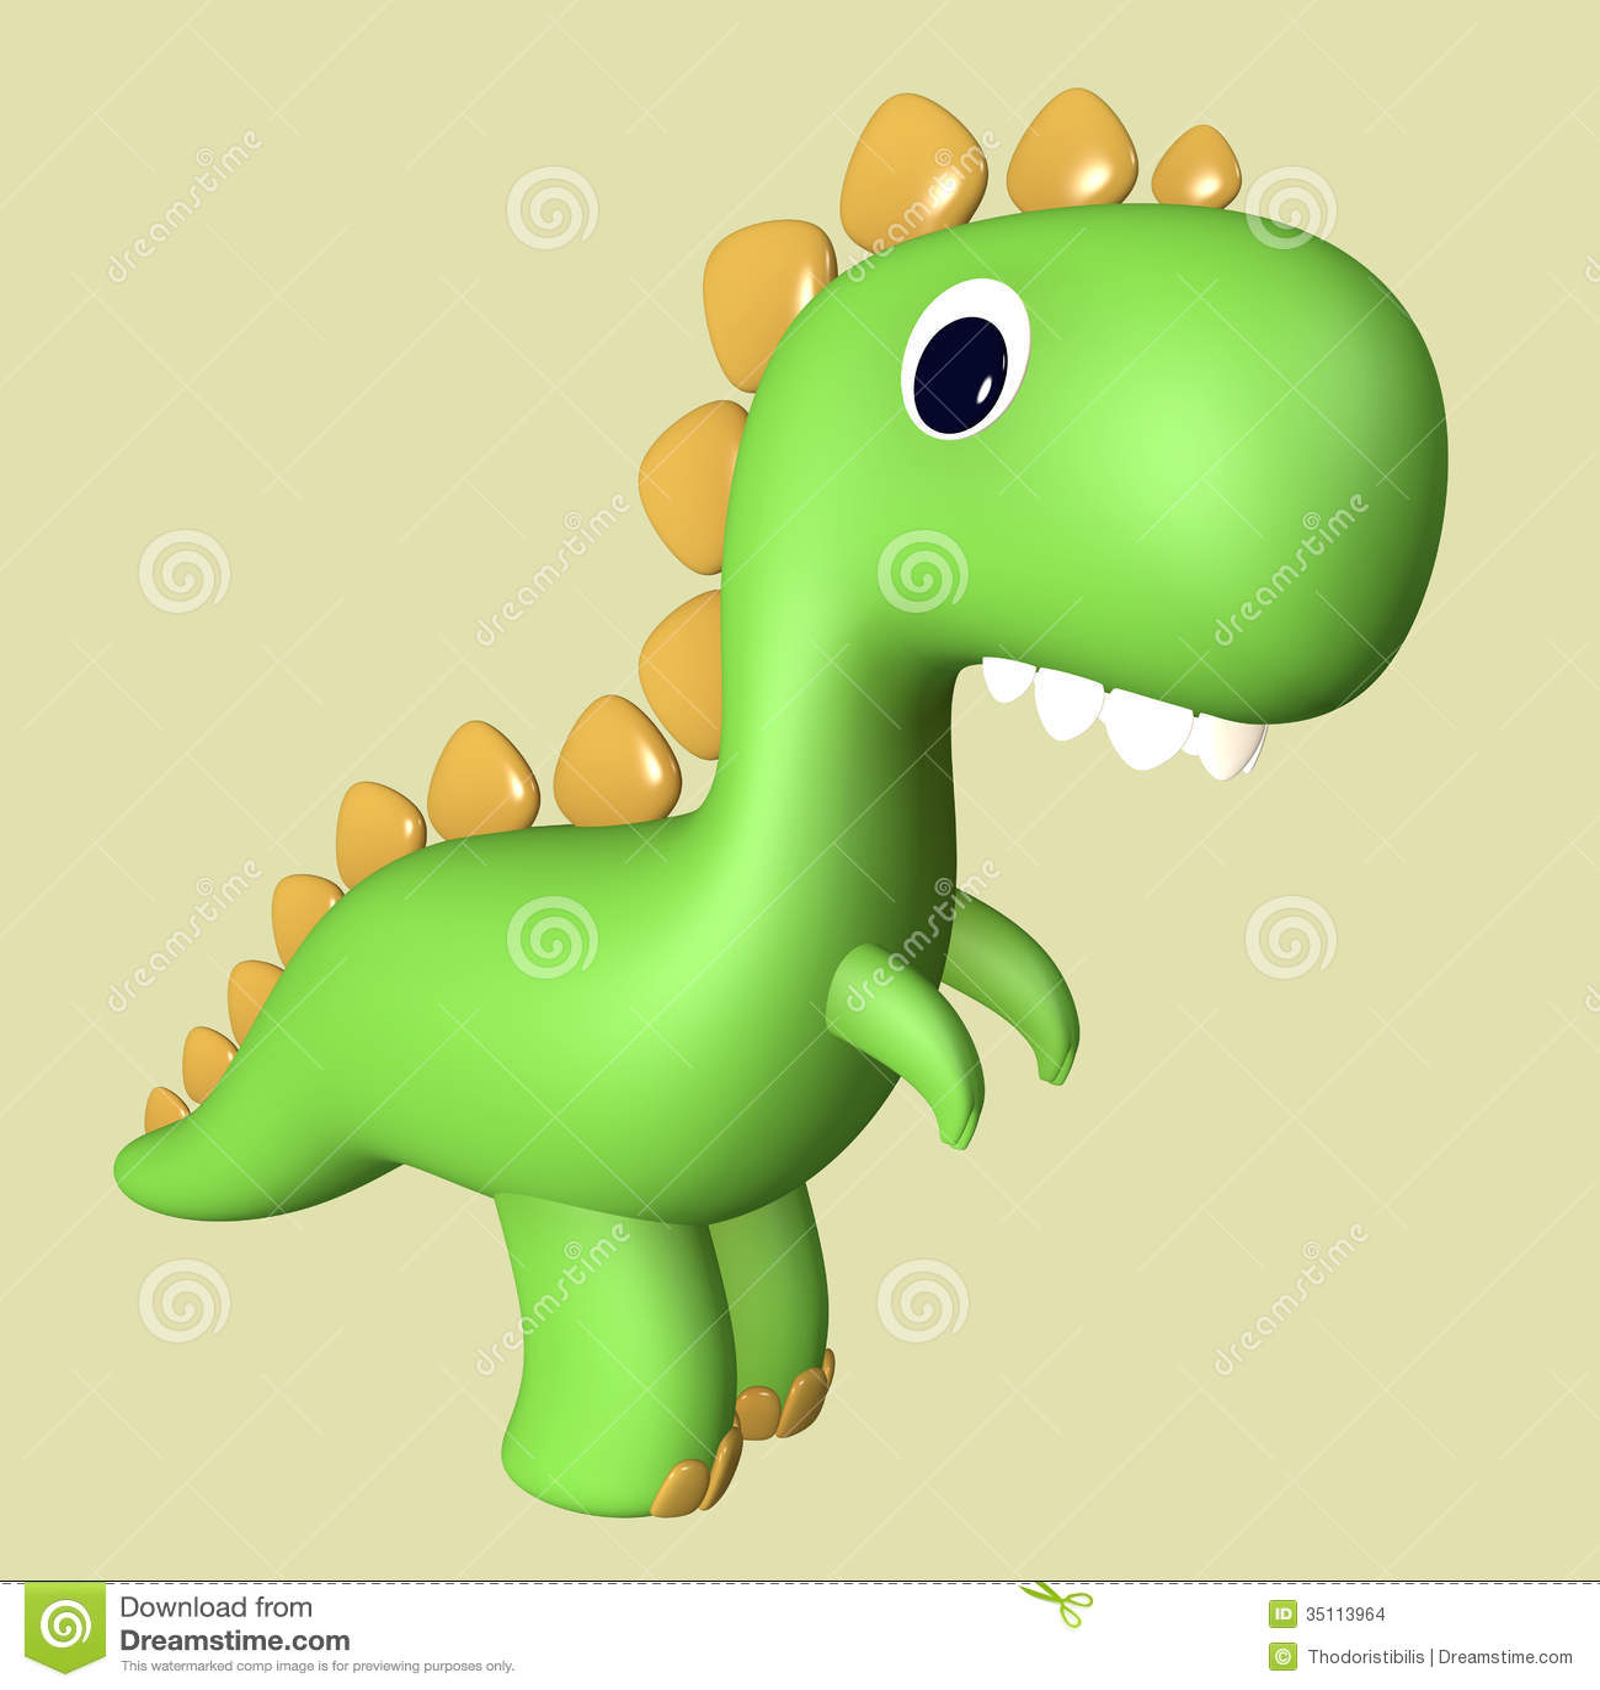 Cartoon Funny Green 3D Tyrannosaurus Rex Dinosaur Stock ...